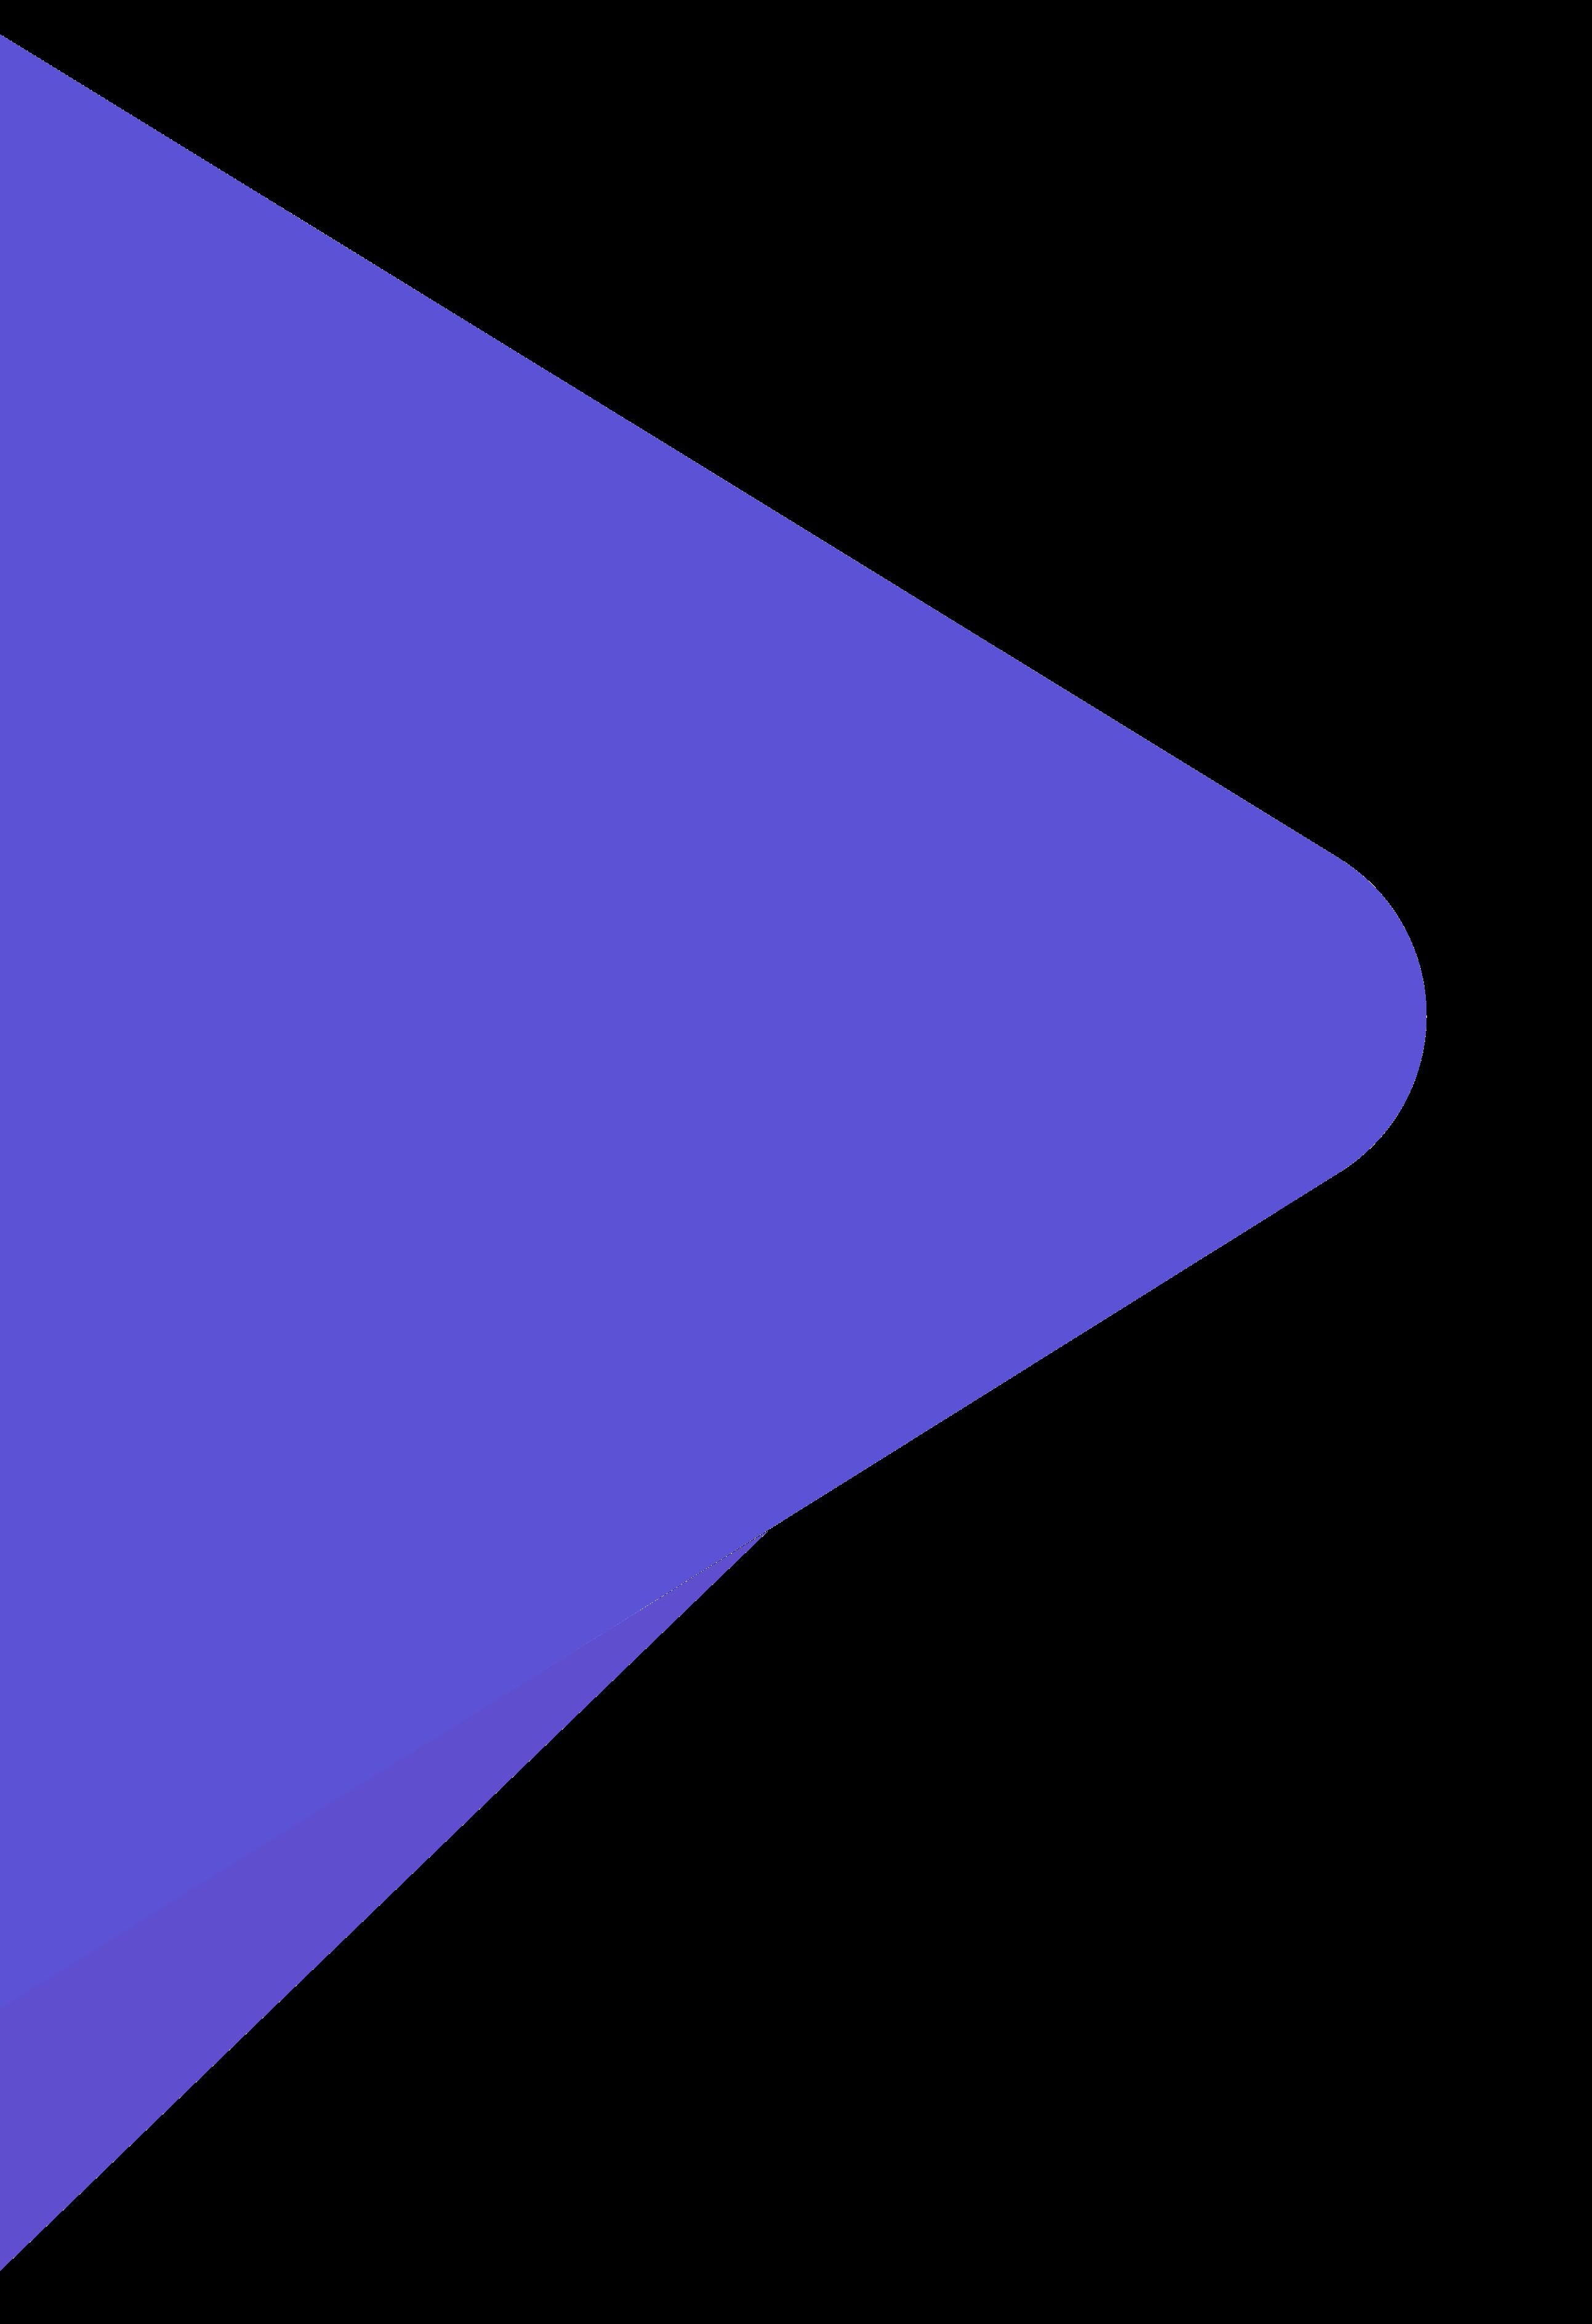 triangle-no-margin